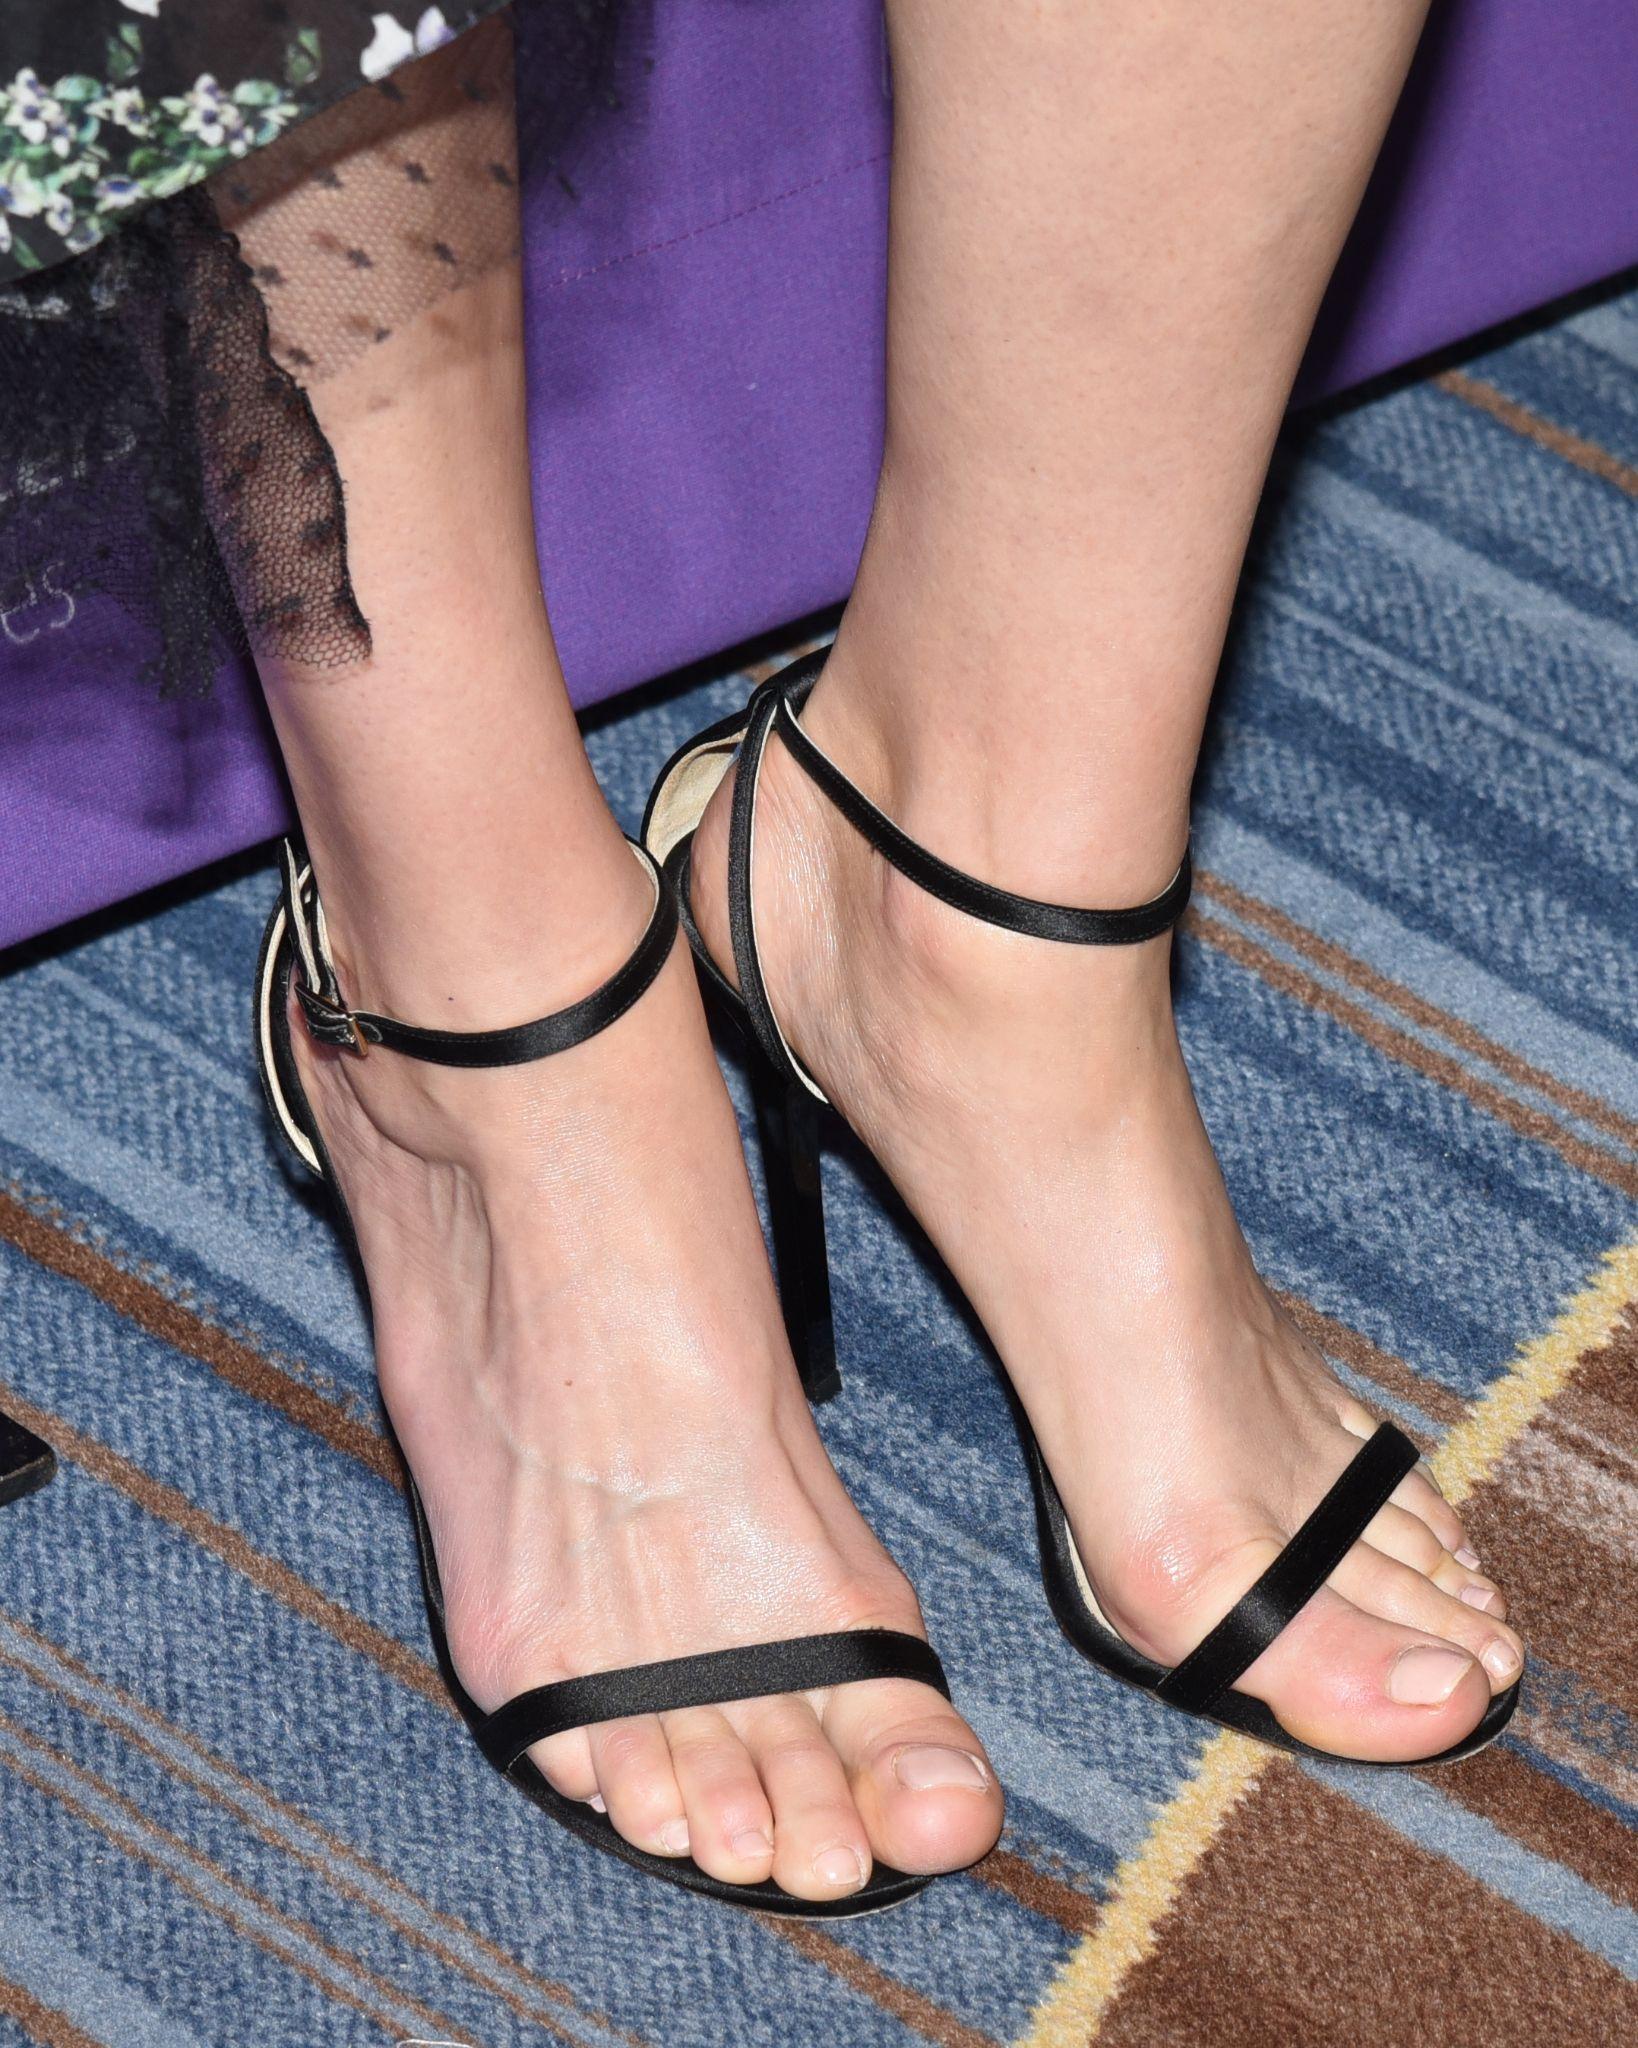 butt Feet Amber Valletta naked photo 2017